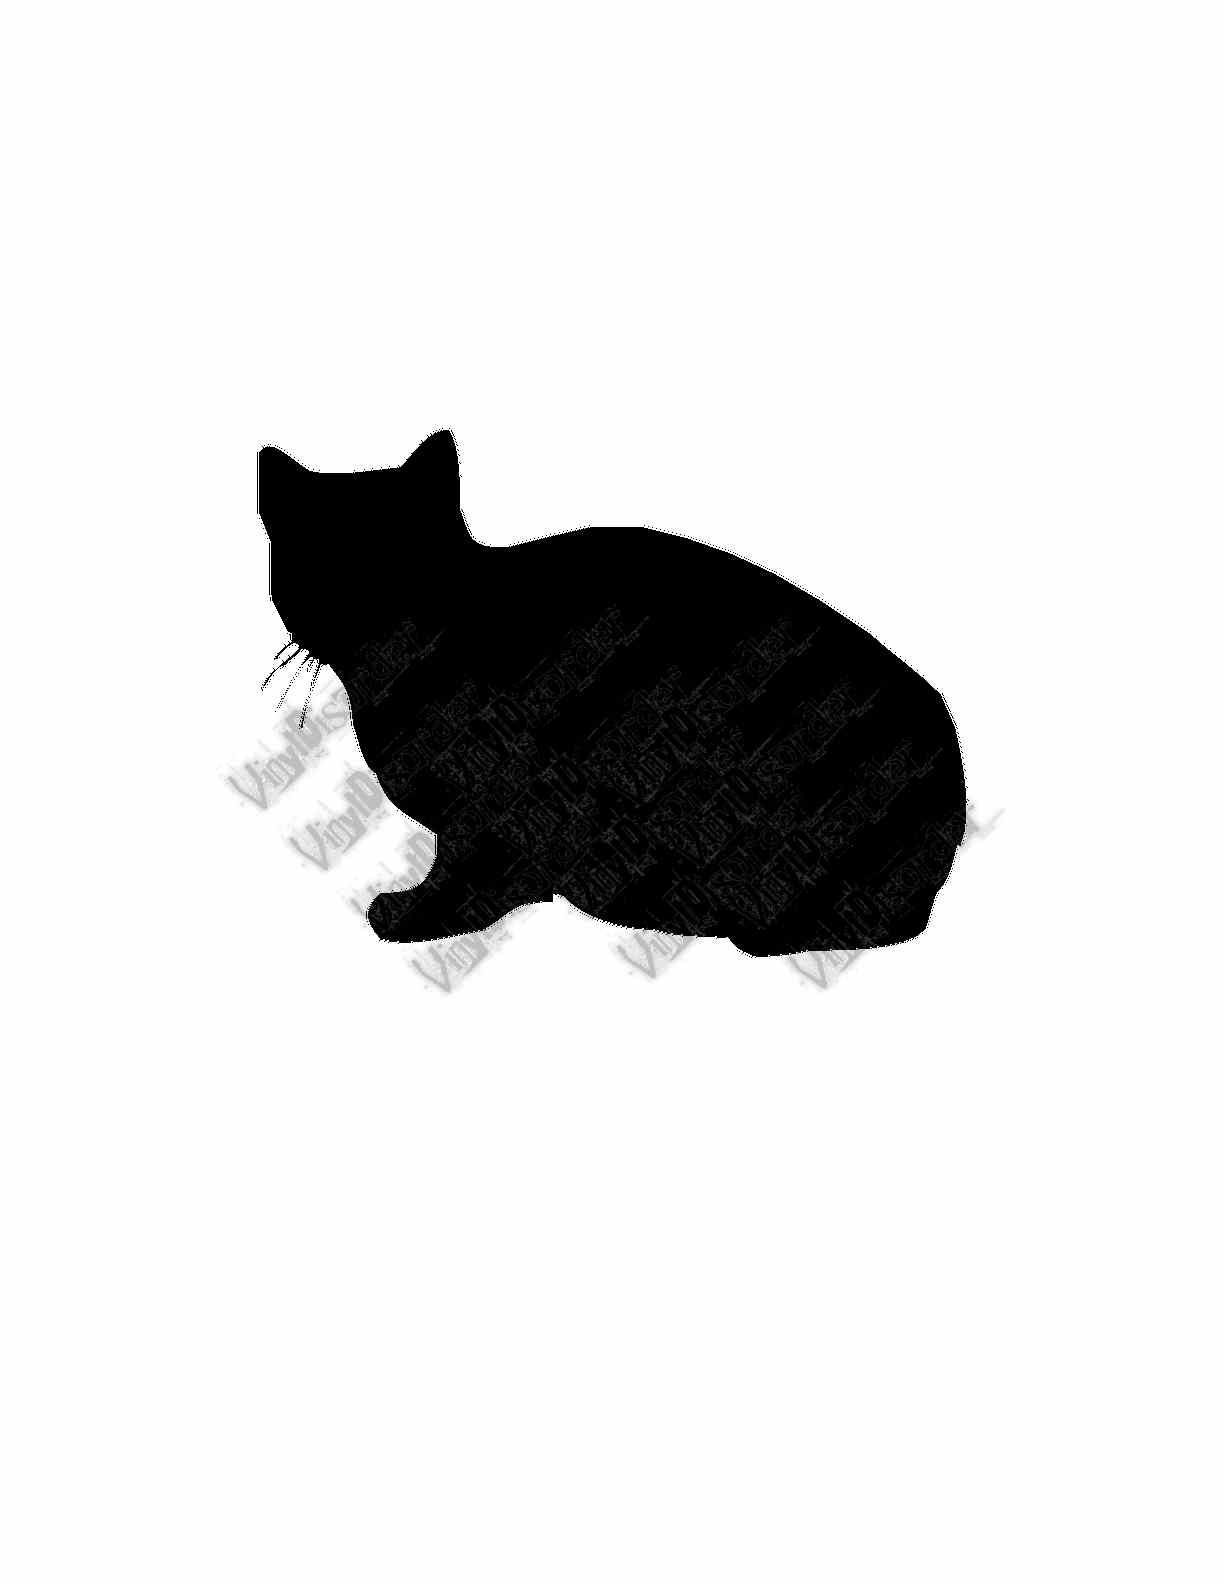 Short Hair Sit Cat Wall Decal Custom Vinyl Decal Cats - Vinyl decal cat pinterest